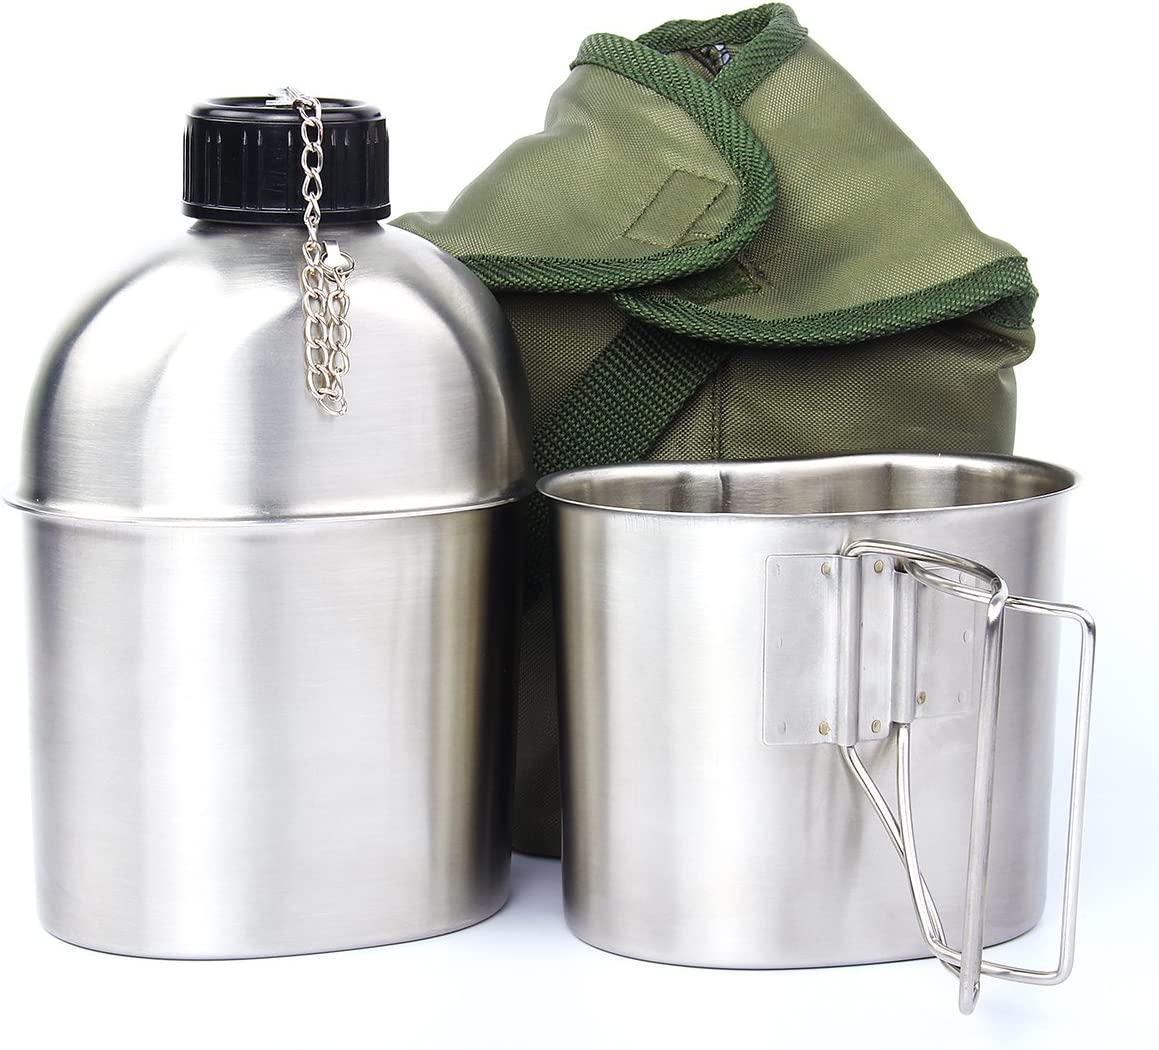 TargetEvo Cantimplora militar de acero inoxidable de 1 cuarto portátil con taza de 0.5 qt cubierta verde para camping, senderismo, G.I.